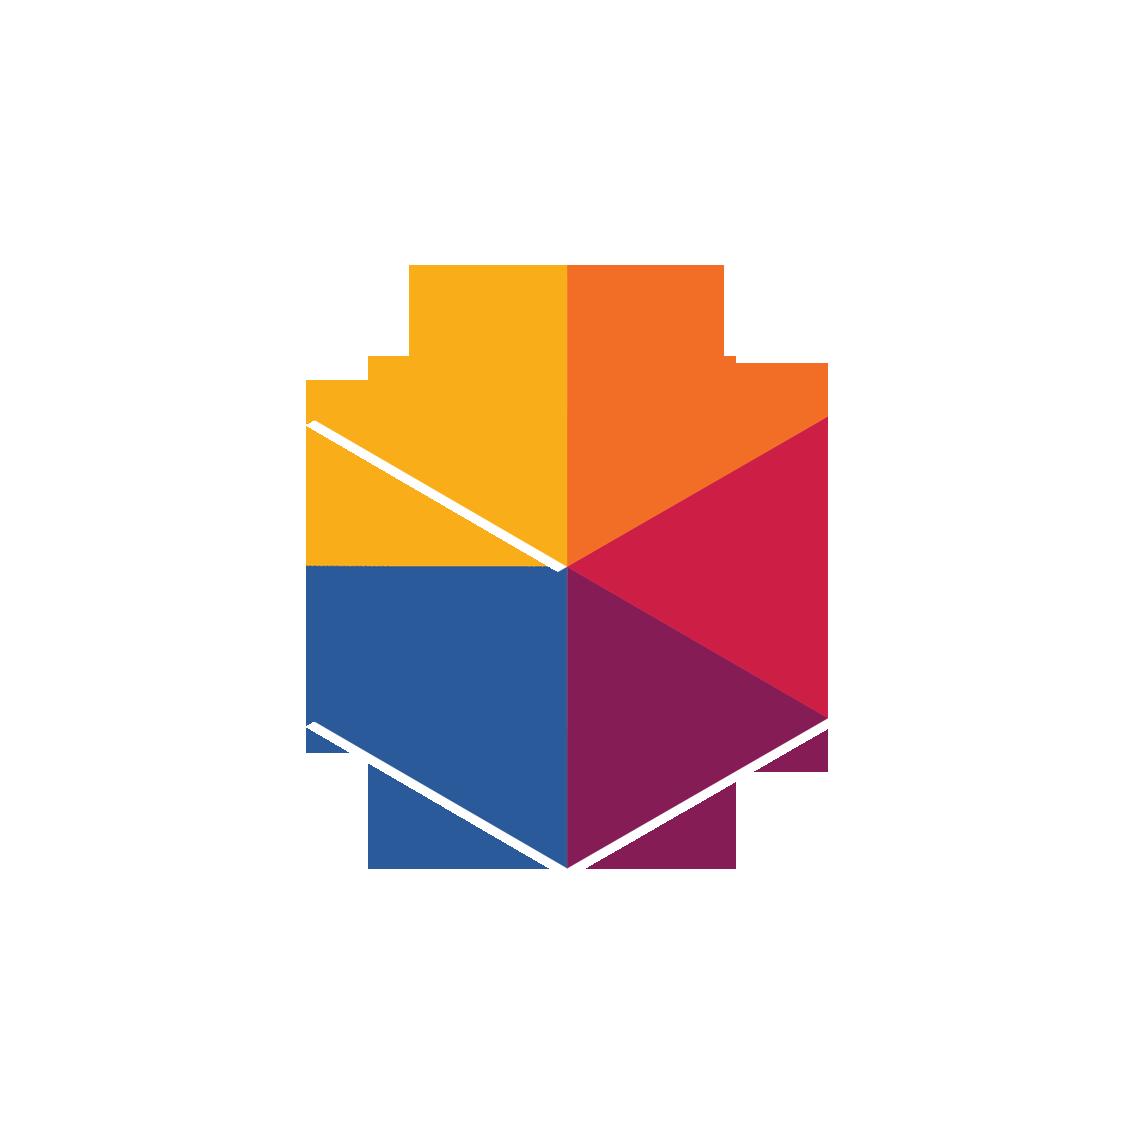 1135x1134 Png Vector Tumblr Logo Download Free